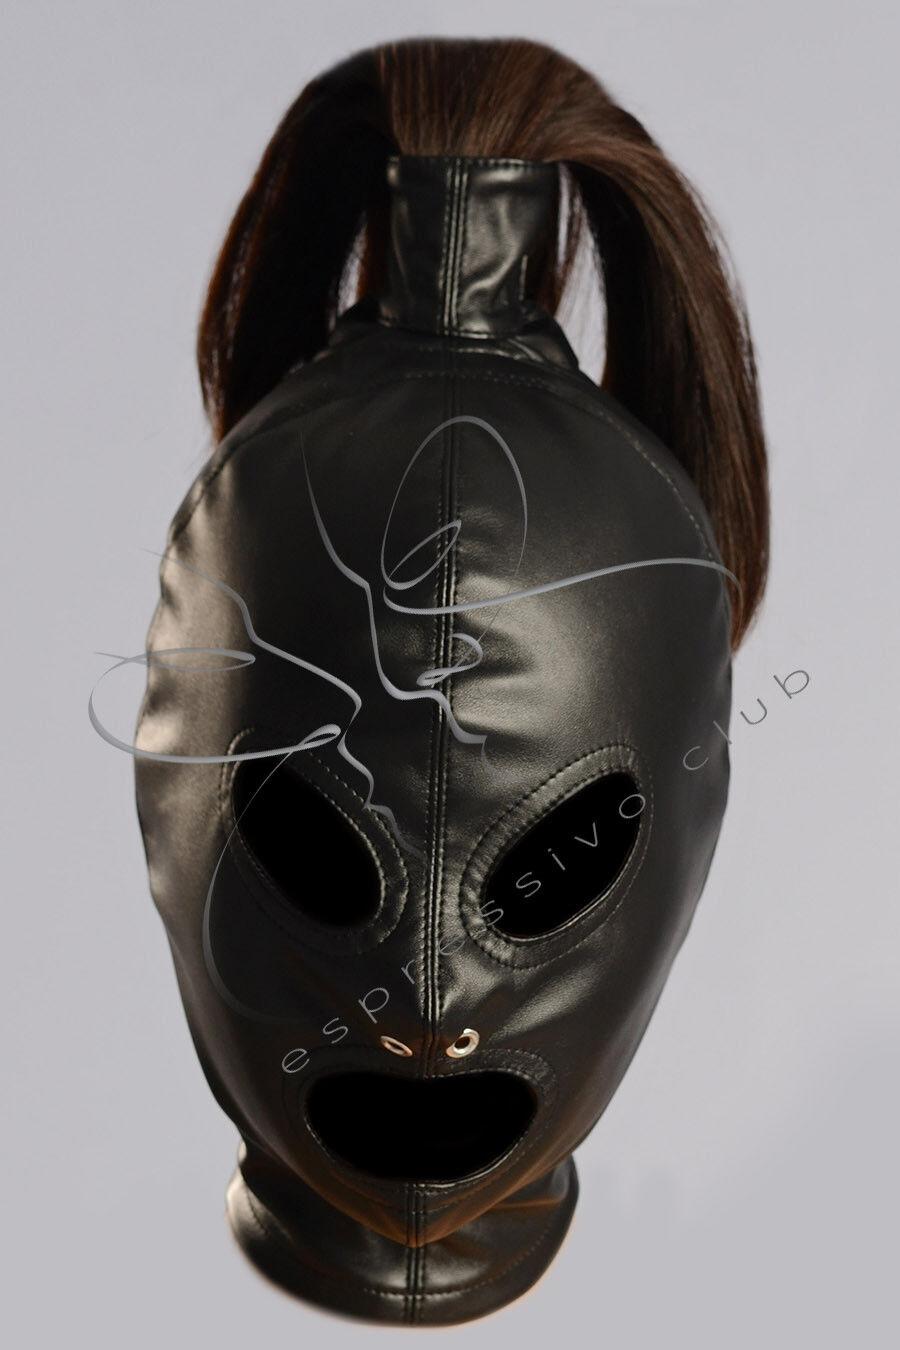 Ponytail Hood + eyes blindfold and mouth mask, Vegan leather